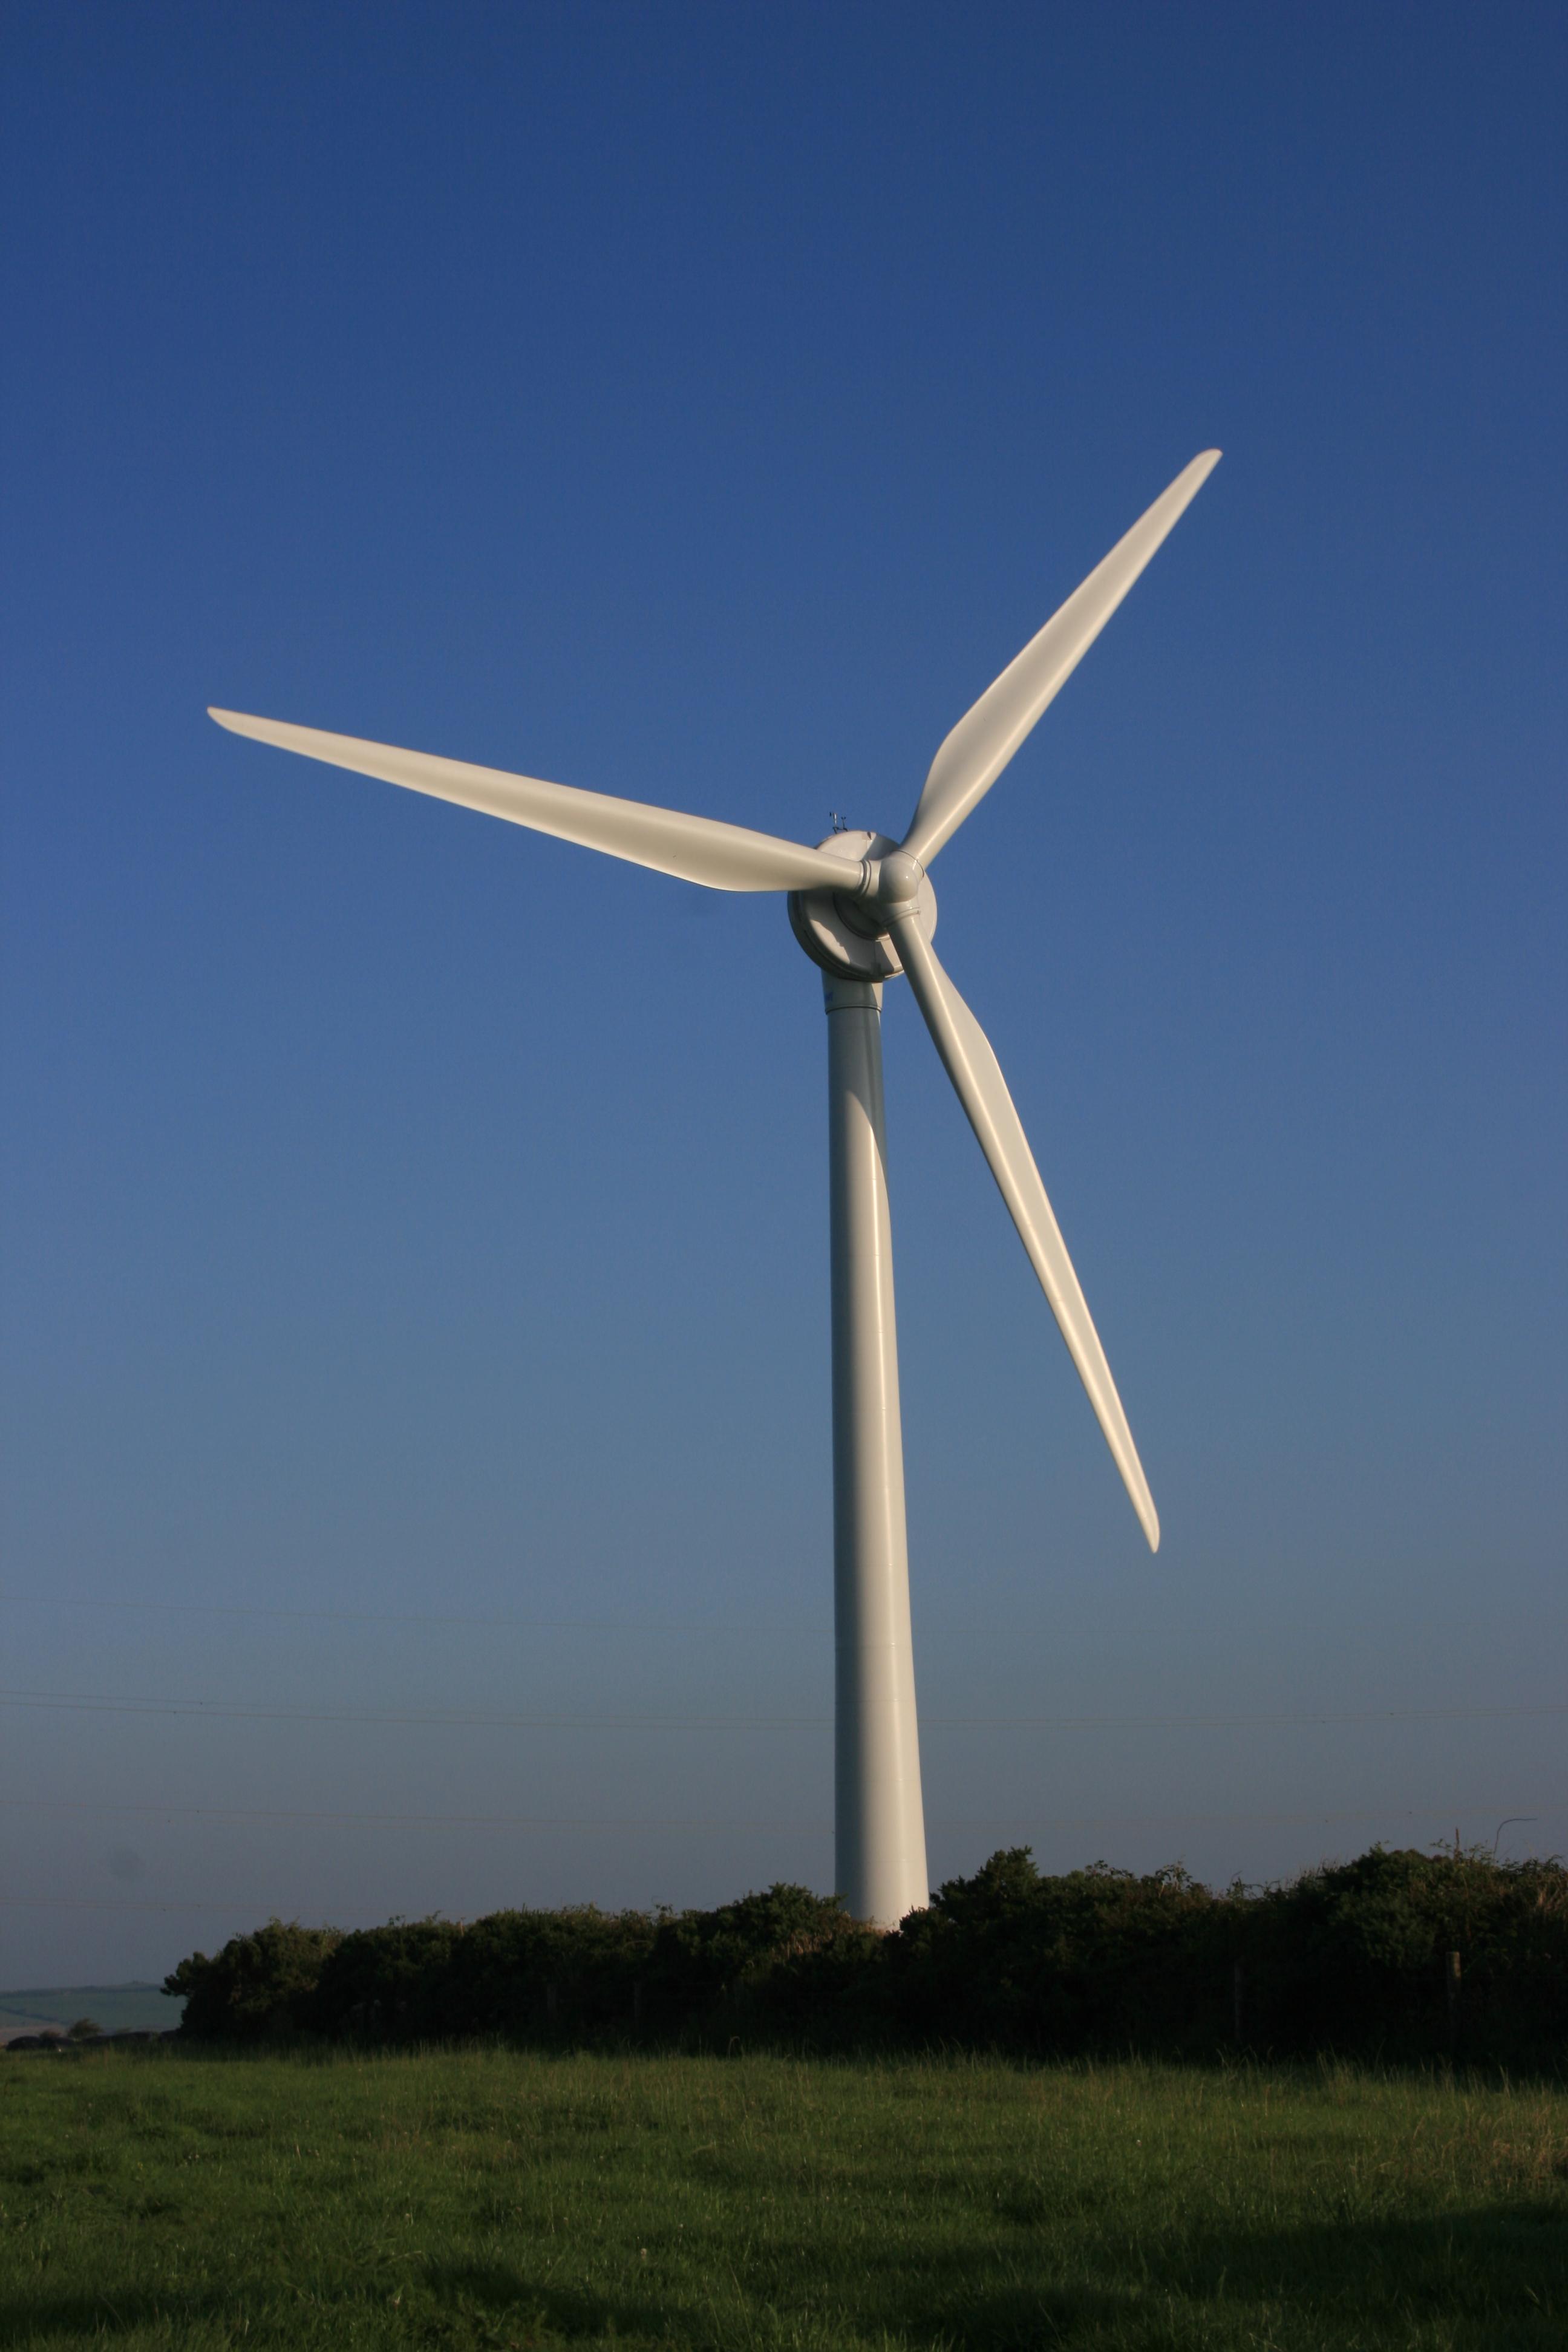 Old Whittington Wind Turbine Generator Peter Duffy Ltd Civil